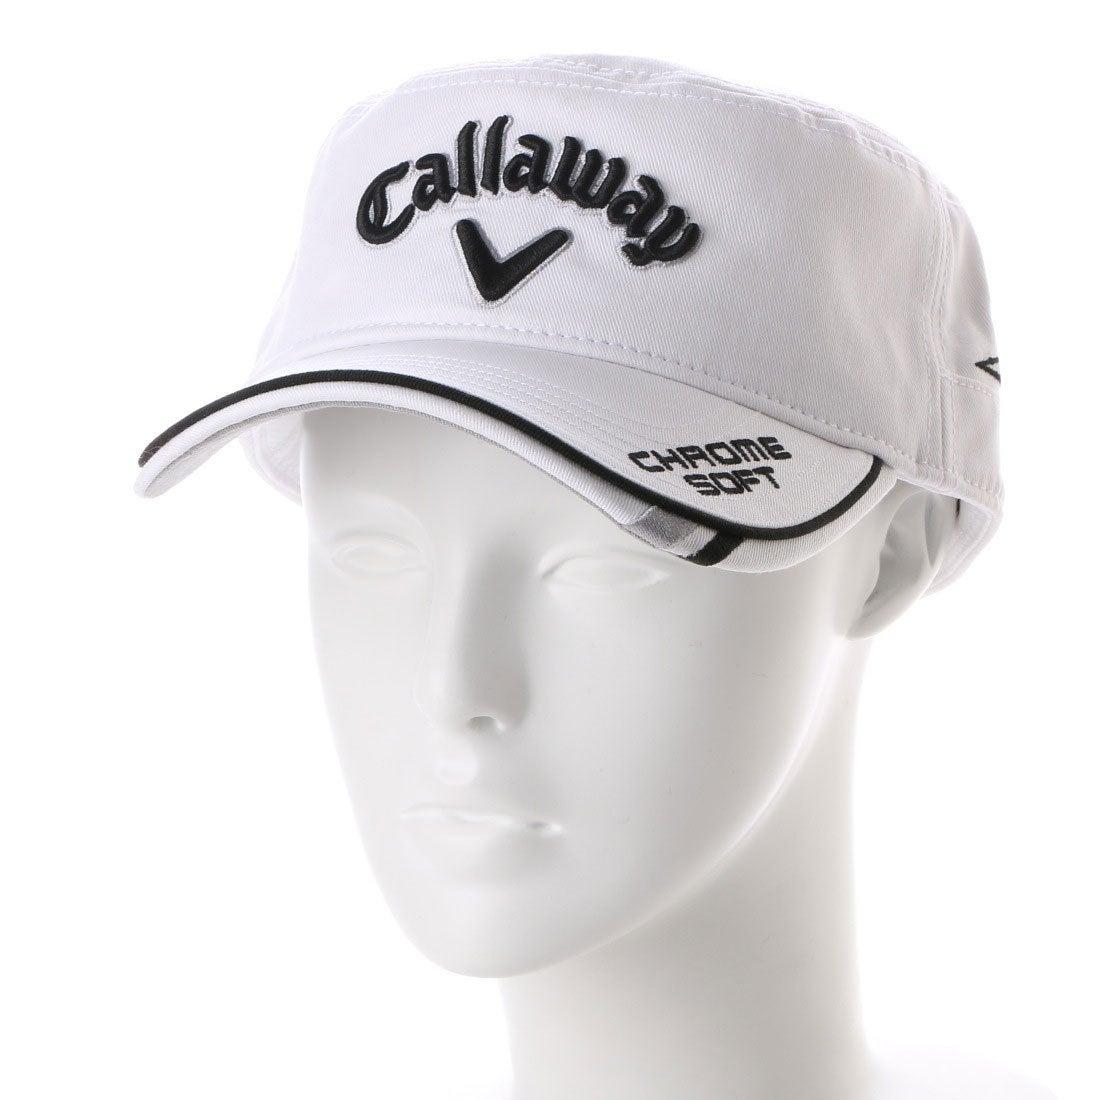 【SALE 20%OFF】キャロウェイ Callaway メンズ ゴルフ ワークキャップ Callaway Tour Work Cap 16 JM 4885882735 メンズ